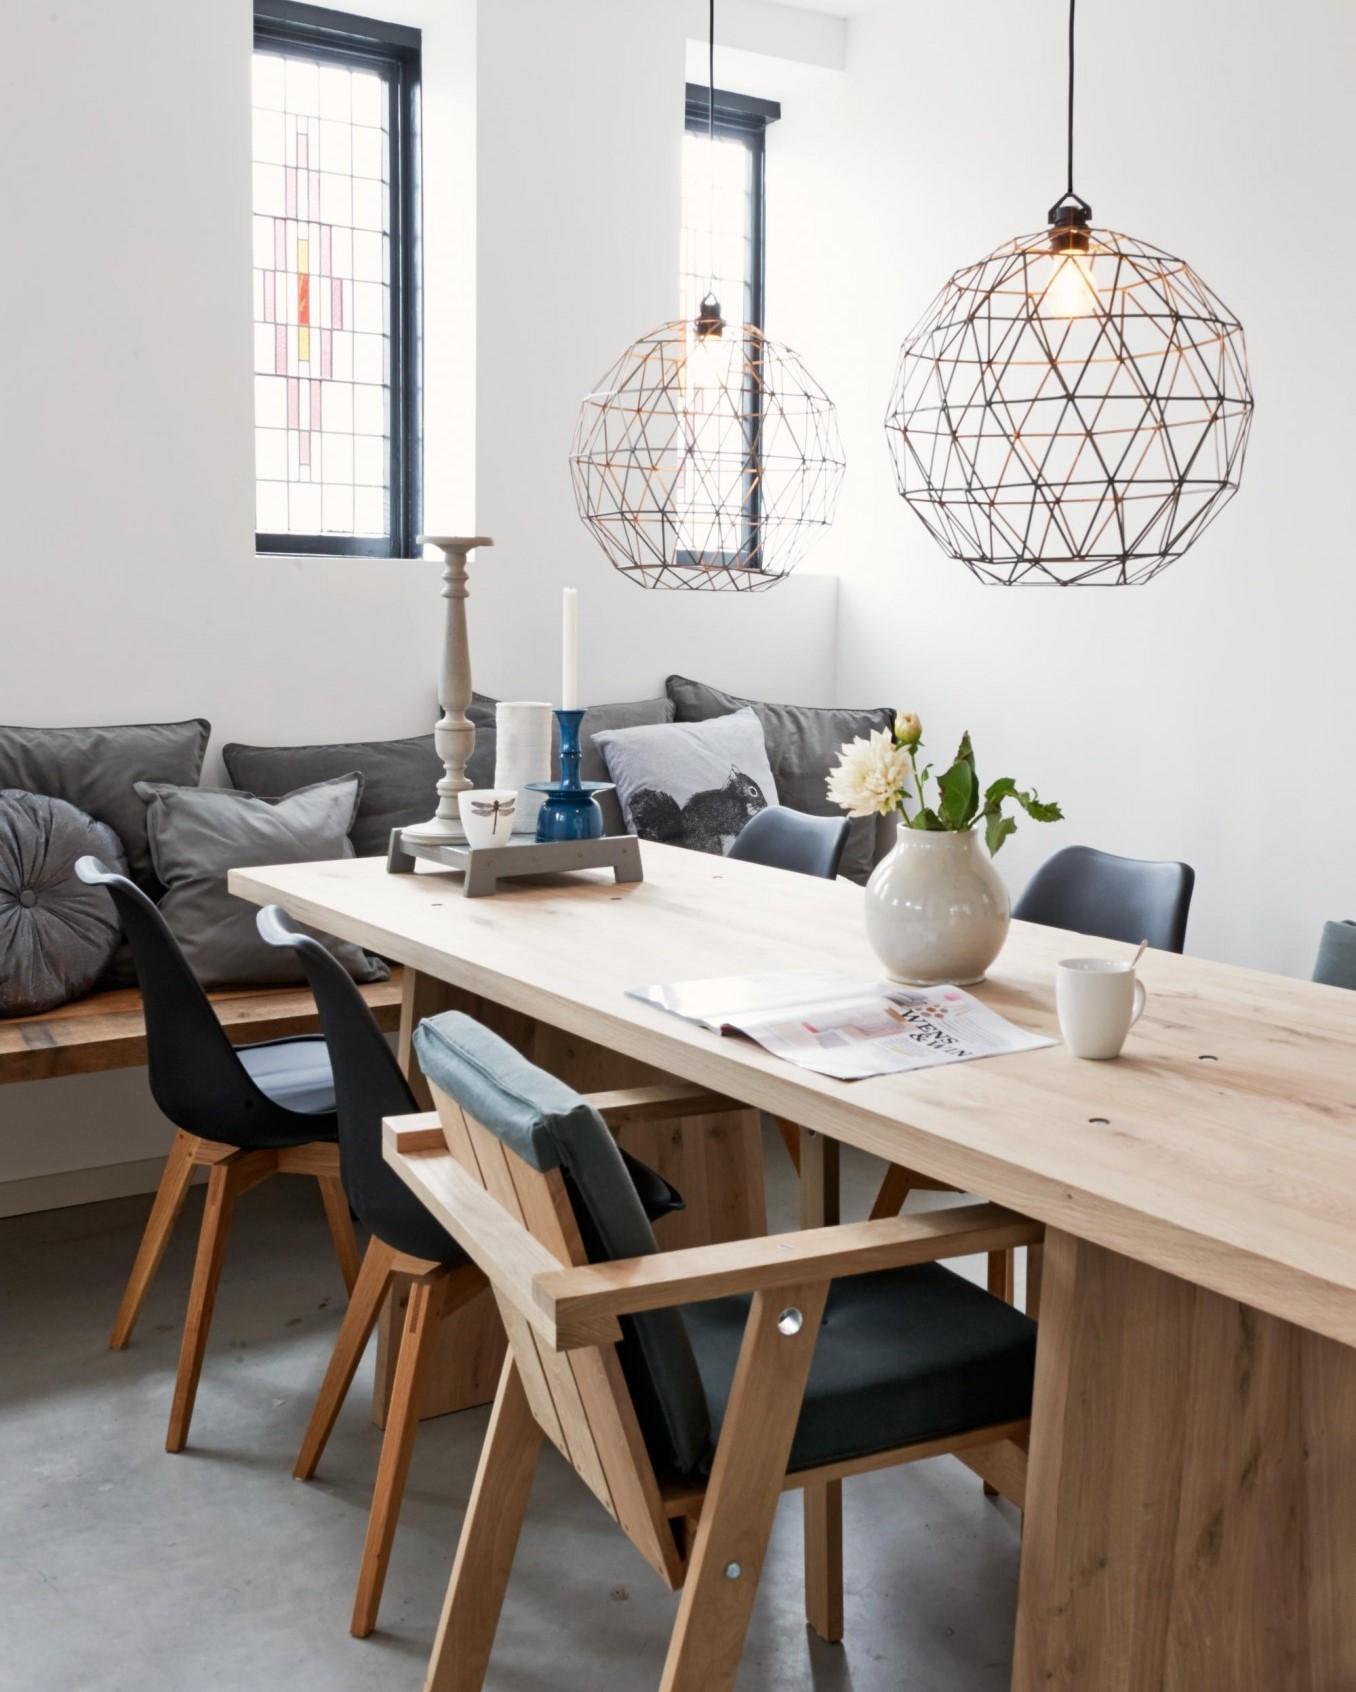 Monochrome Ruangan Bernuansa Hitam Dan Putih Yang Simple